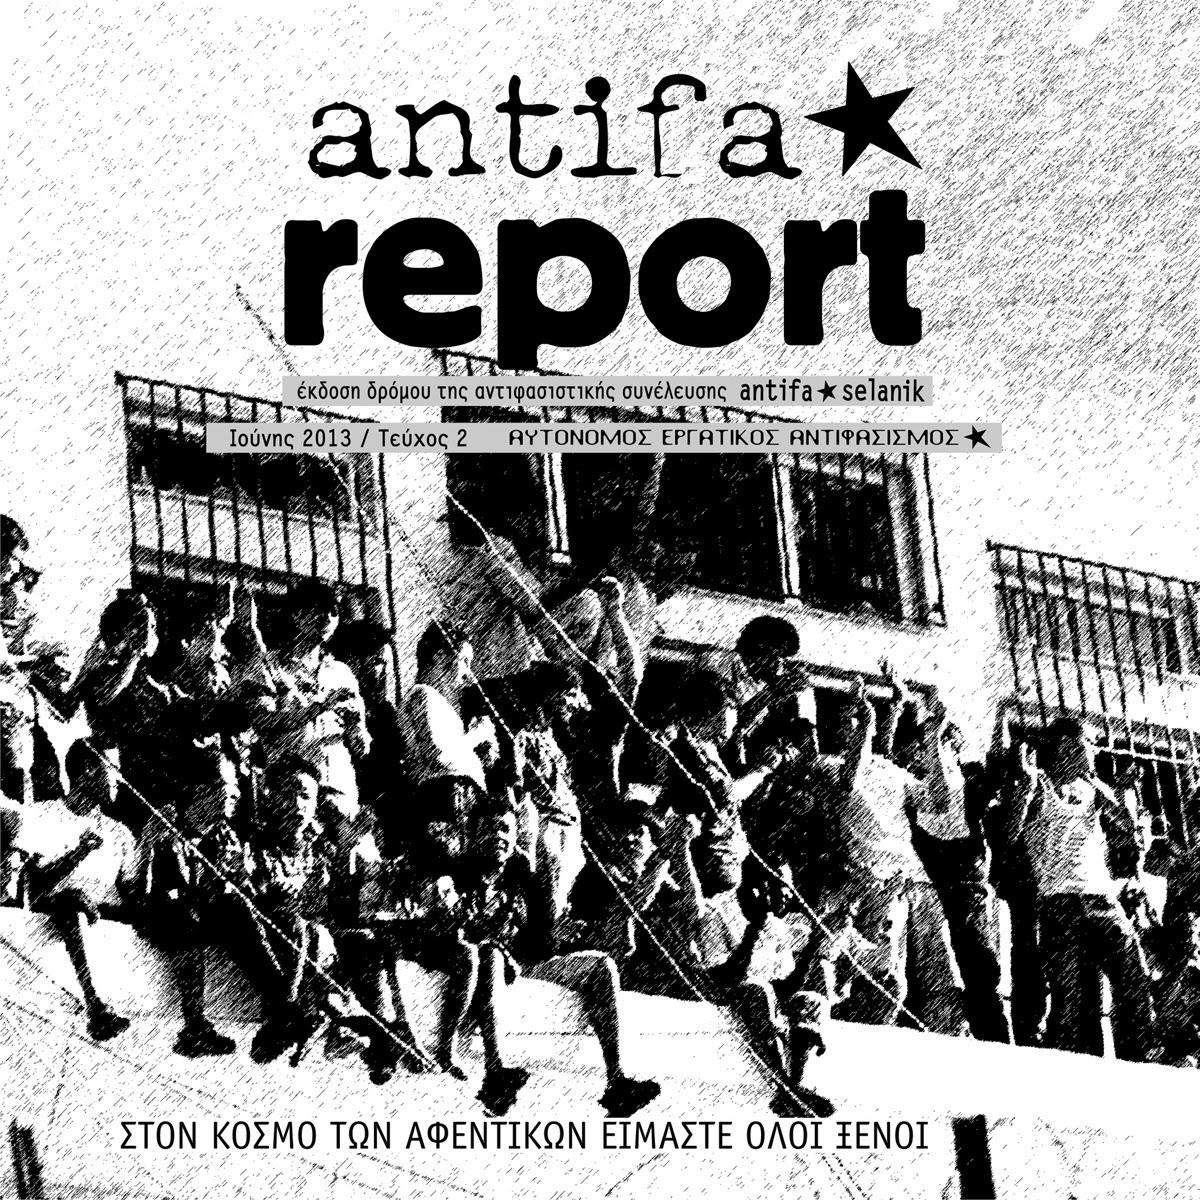 http://issuu.com/antifacommunity/docs/ar_2